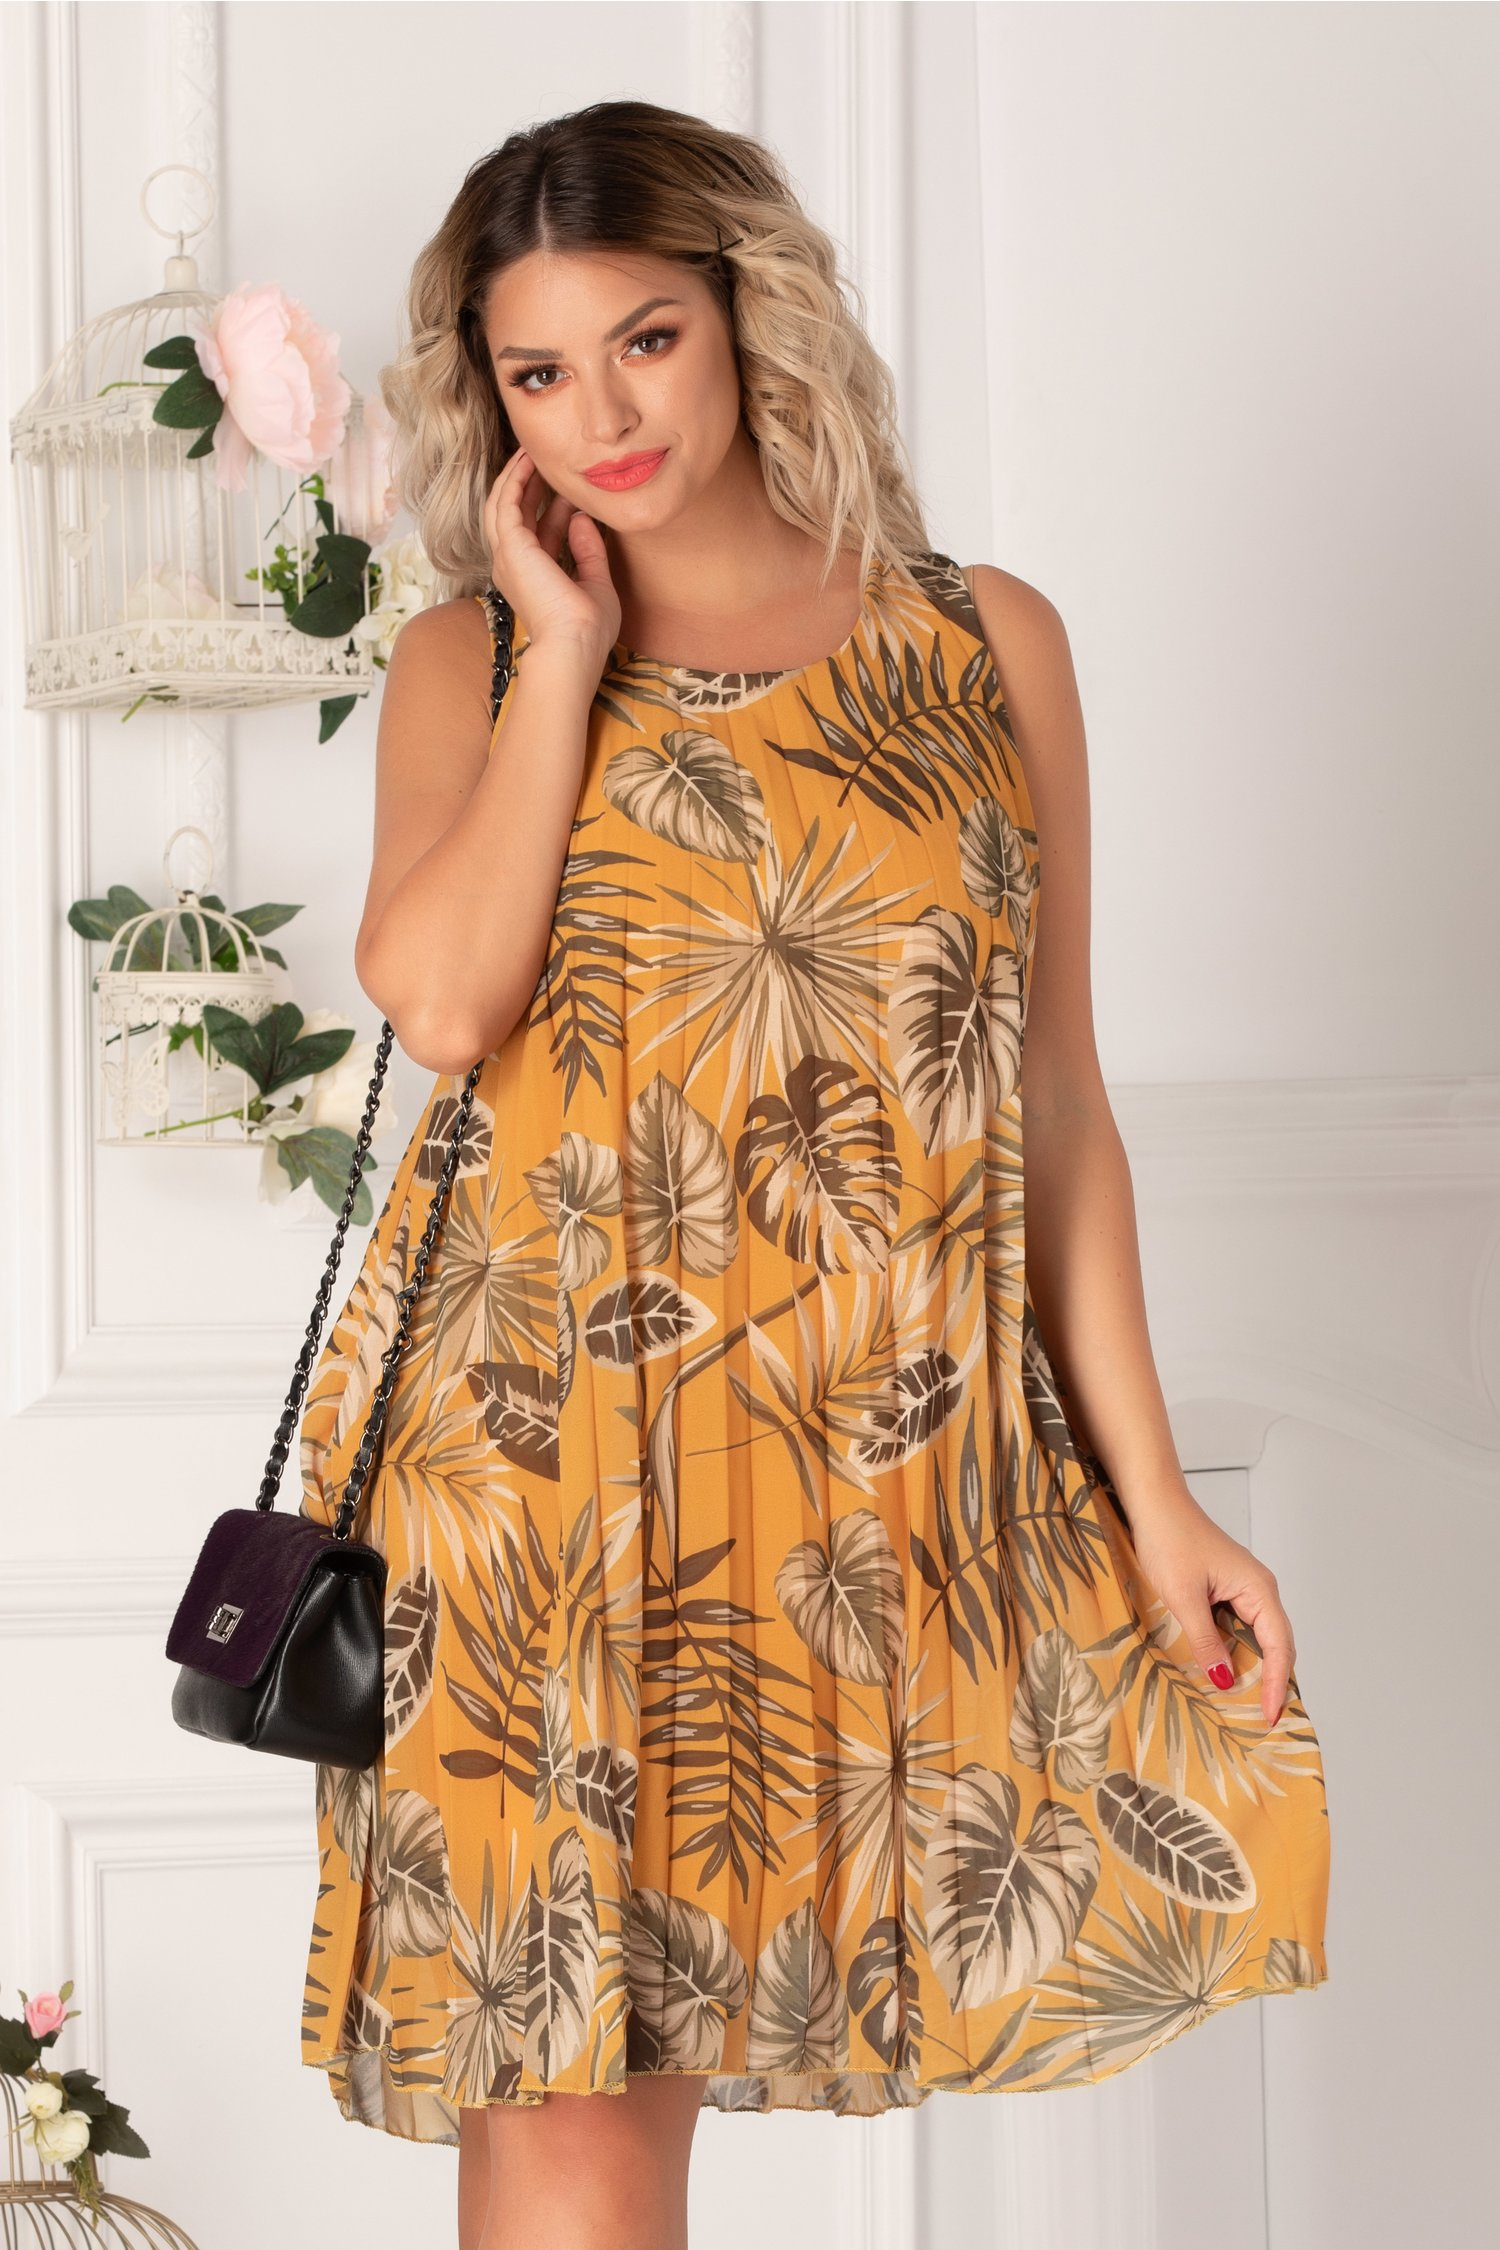 Rochie Patricia plisata galben mustar cu imprimeu exotic